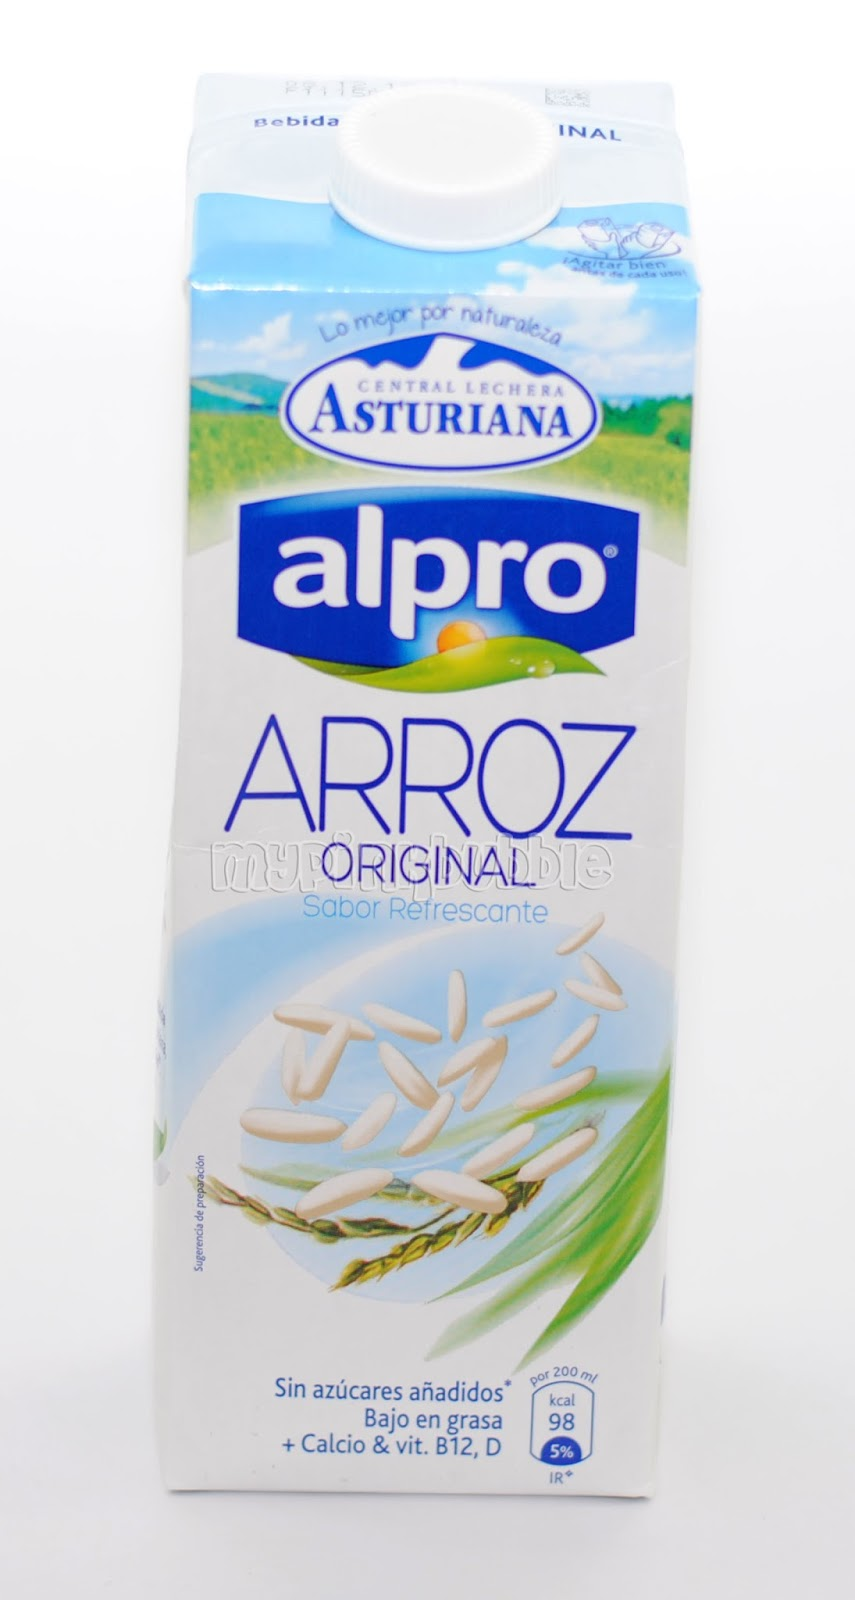 Central lechera asturiana Arroz